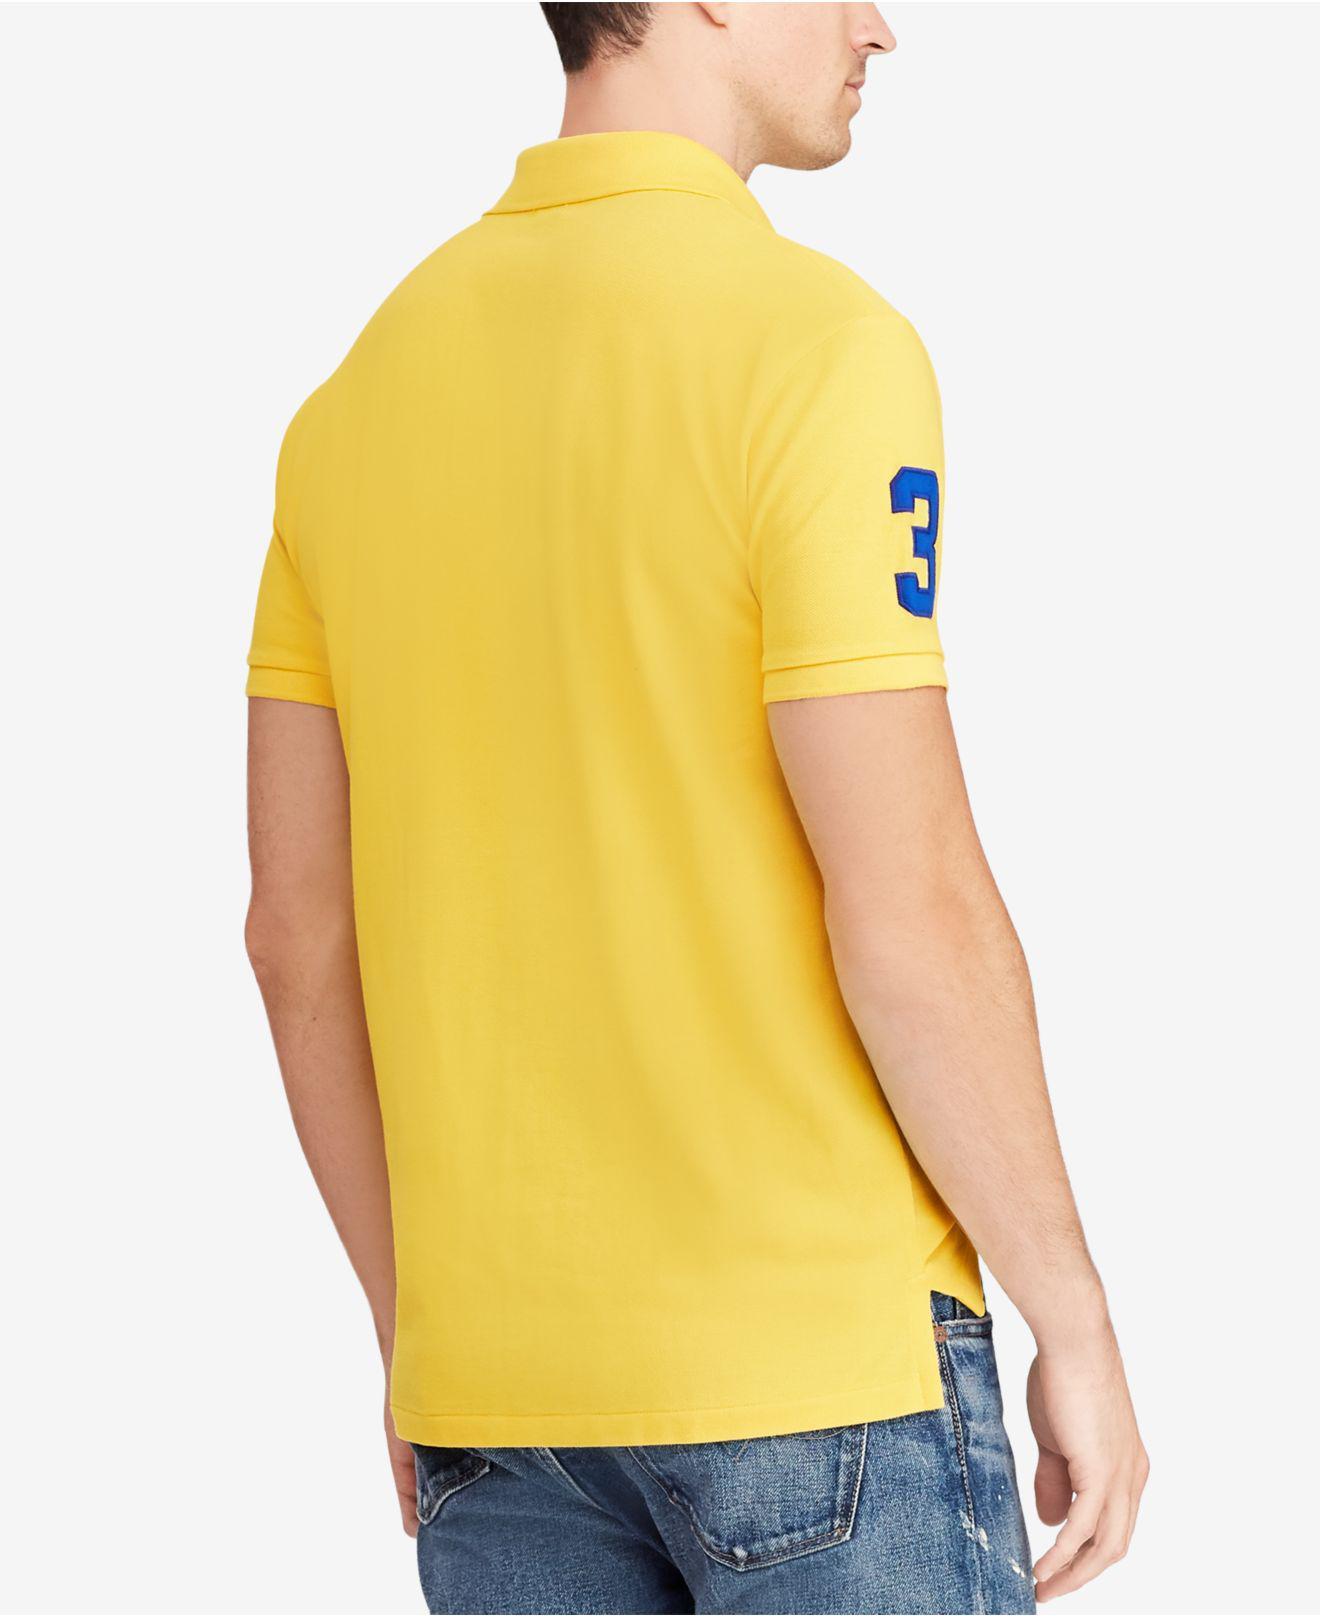 9fcb0e95 ... wholesale lyst polo ralph lauren big pony custom slim fit mesh polo in  yellow for men